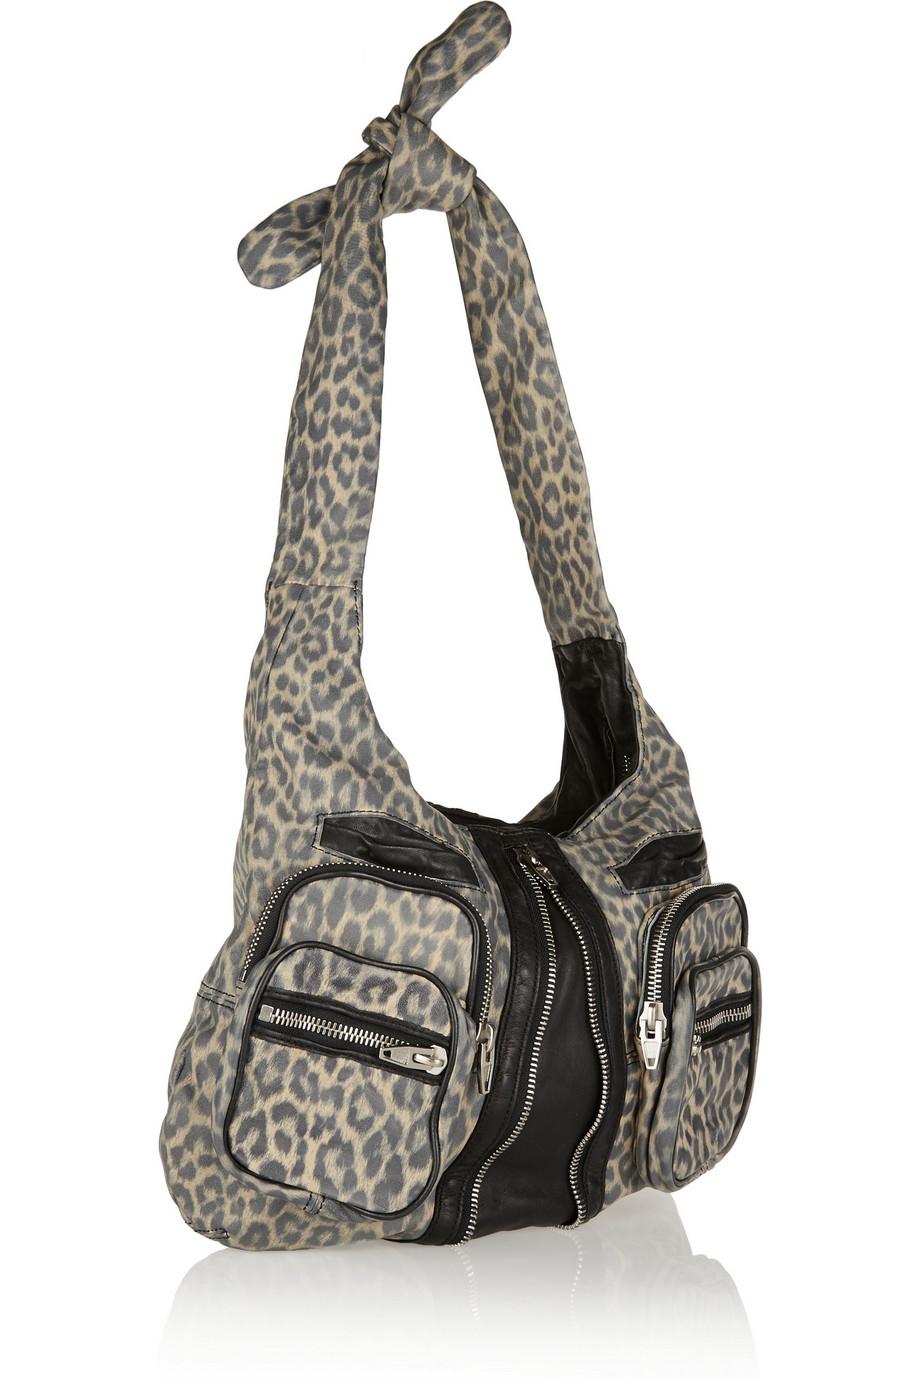 5a760403753d Lyst - Alexander Wang Donna Leopardprint Leather Shoulder Bag in Gray